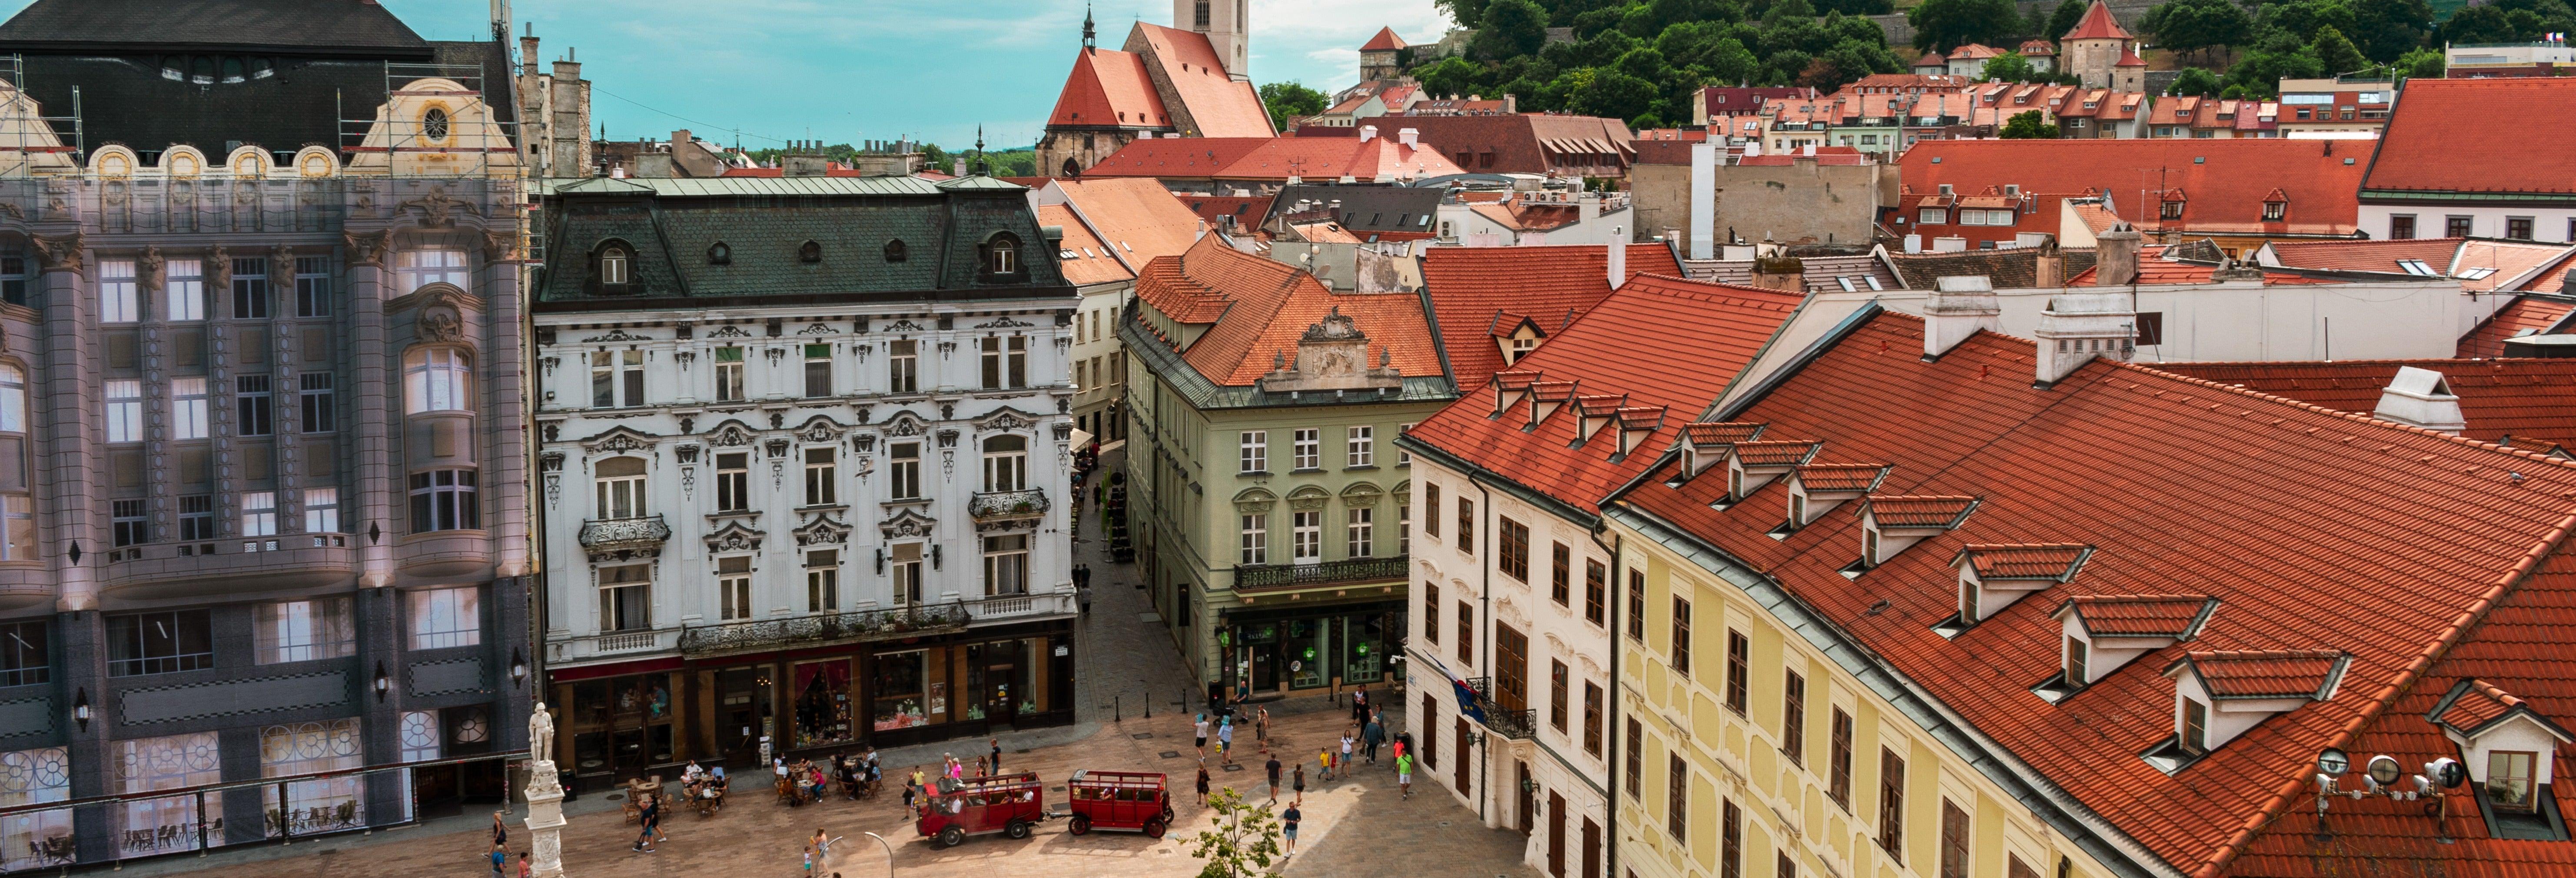 Tour de Bratislava al completo